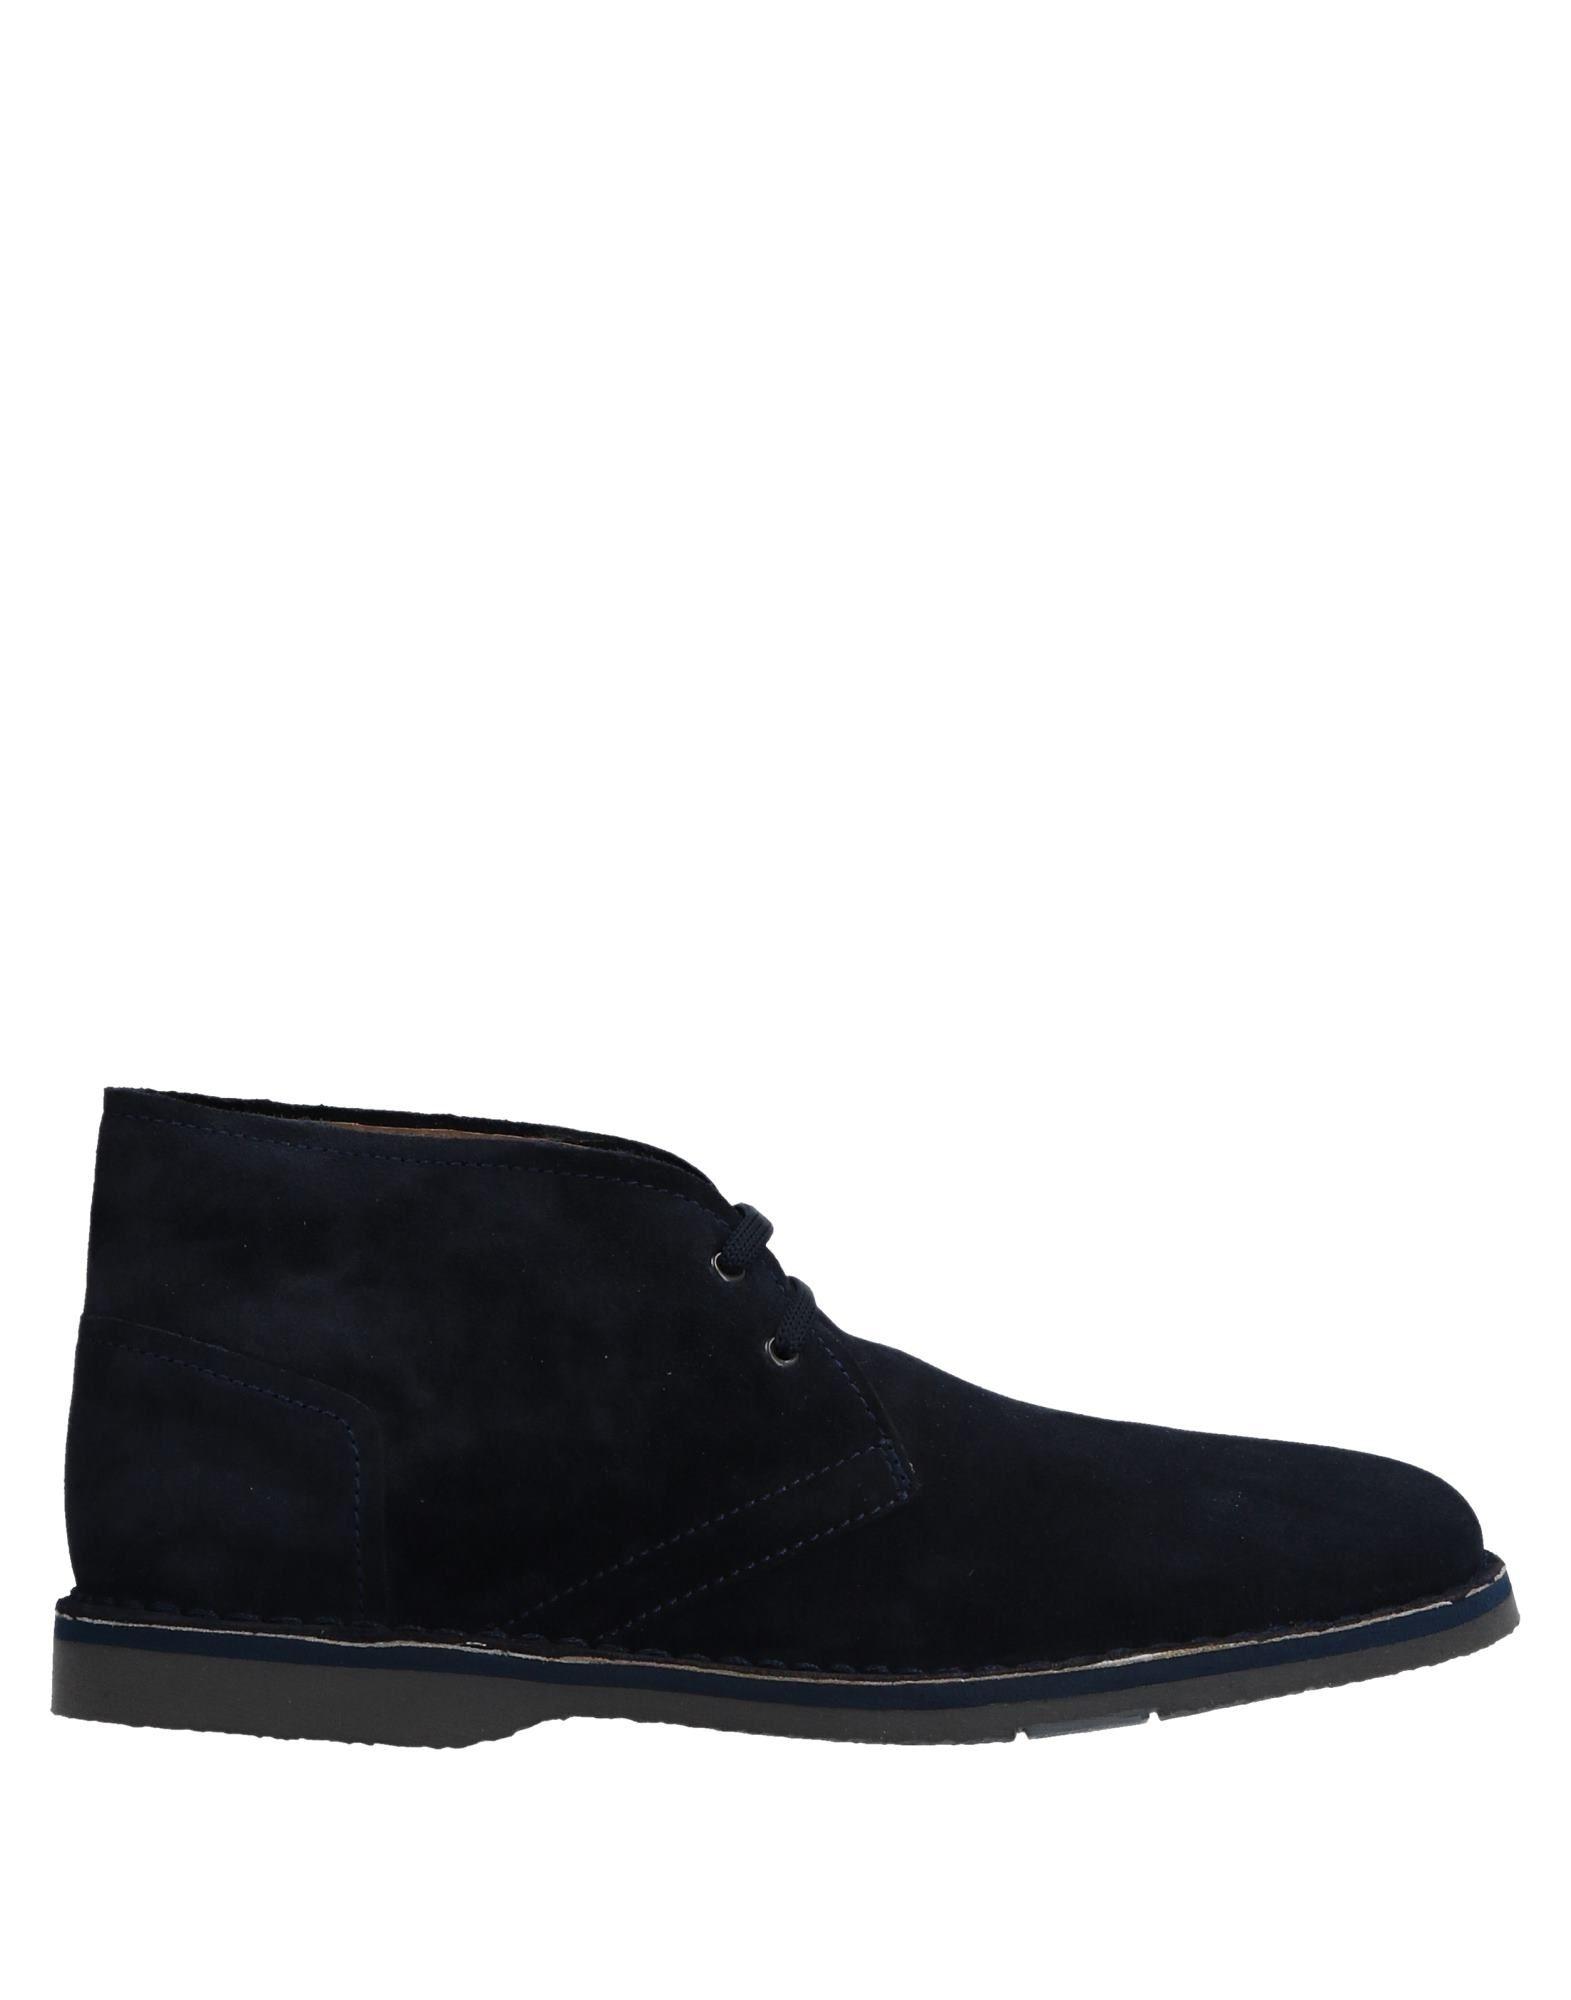 Bikkembergs Boots - Men Bikkembergs United Boots online on  United Bikkembergs Kingdom - 11520722JT c347ee